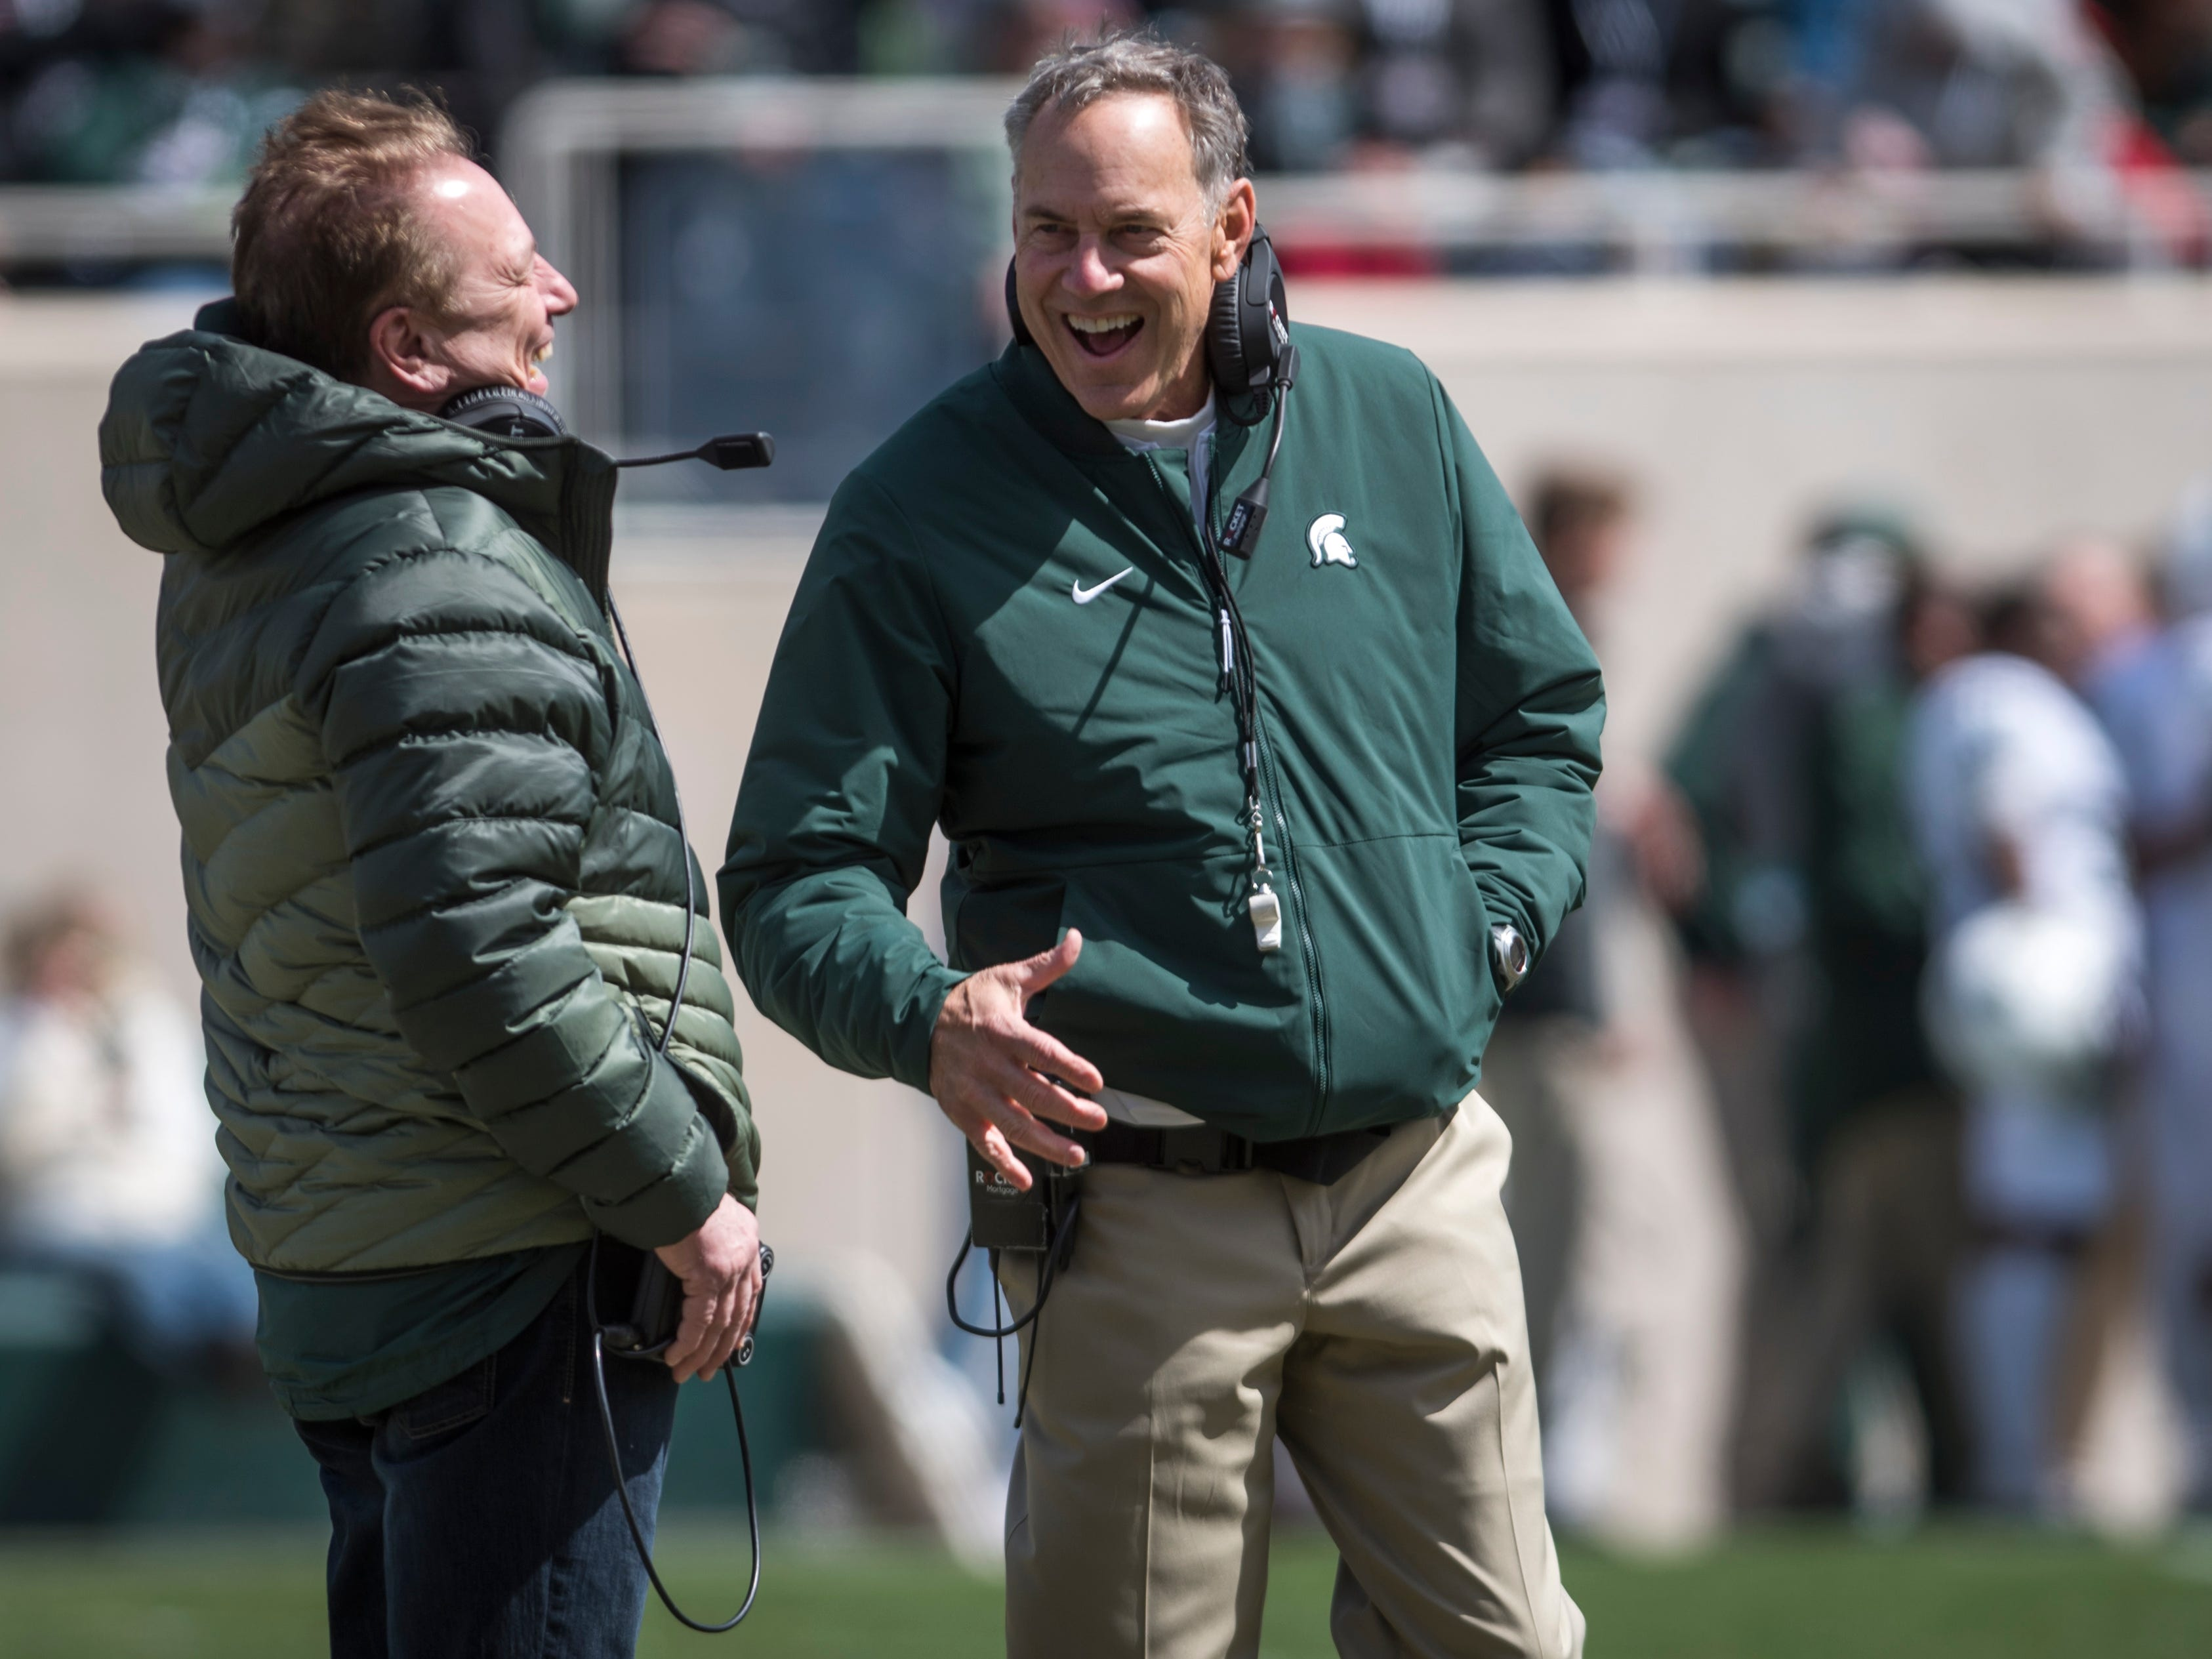 Michigan State men's basketball head coach Tom Izzo, left, jokes with football head coach Mark Dantonio.